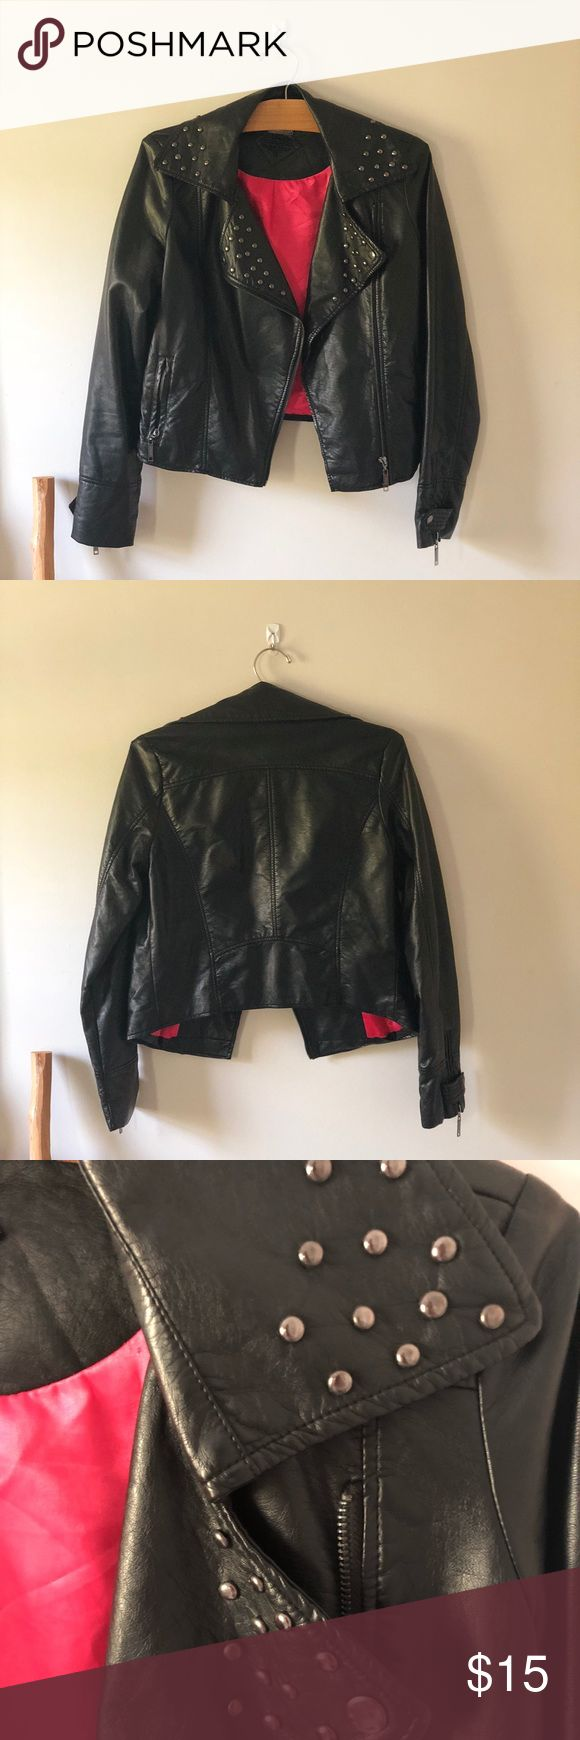 Jou Jou Black Faux Leather Jacket Black faux leather